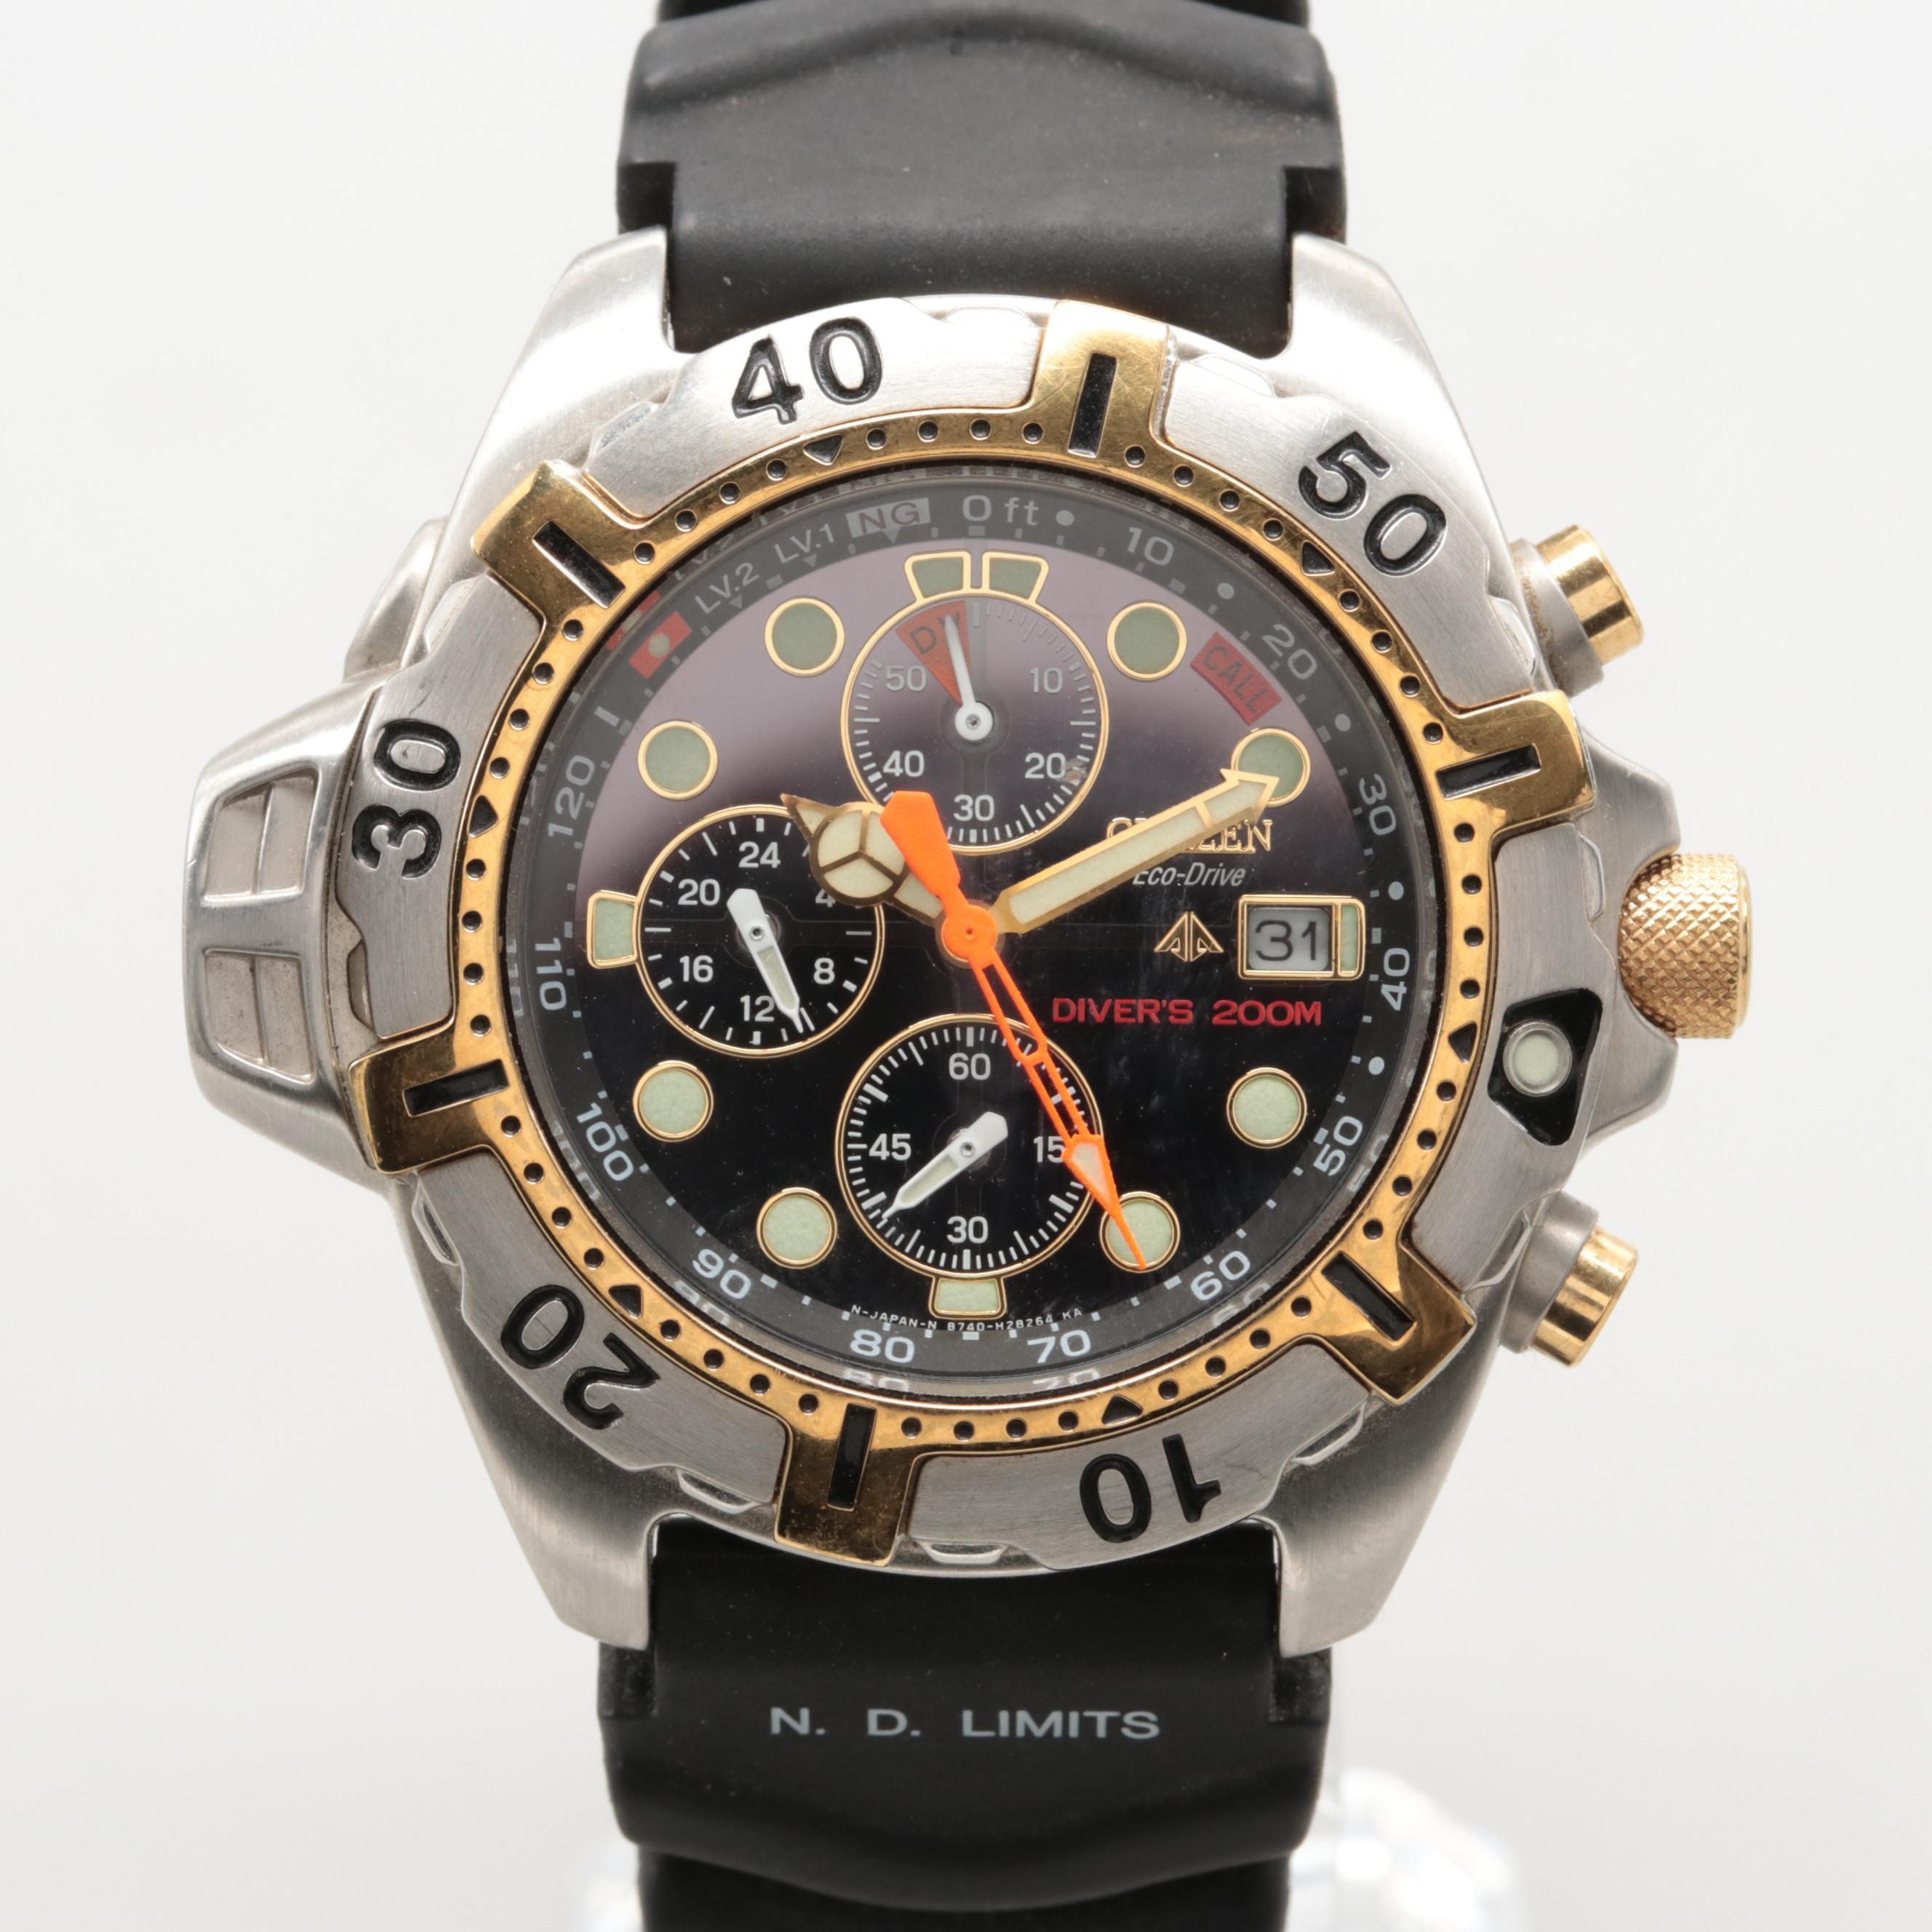 Citizen Eco-Drive Aqualad Chronograph Wristwatch